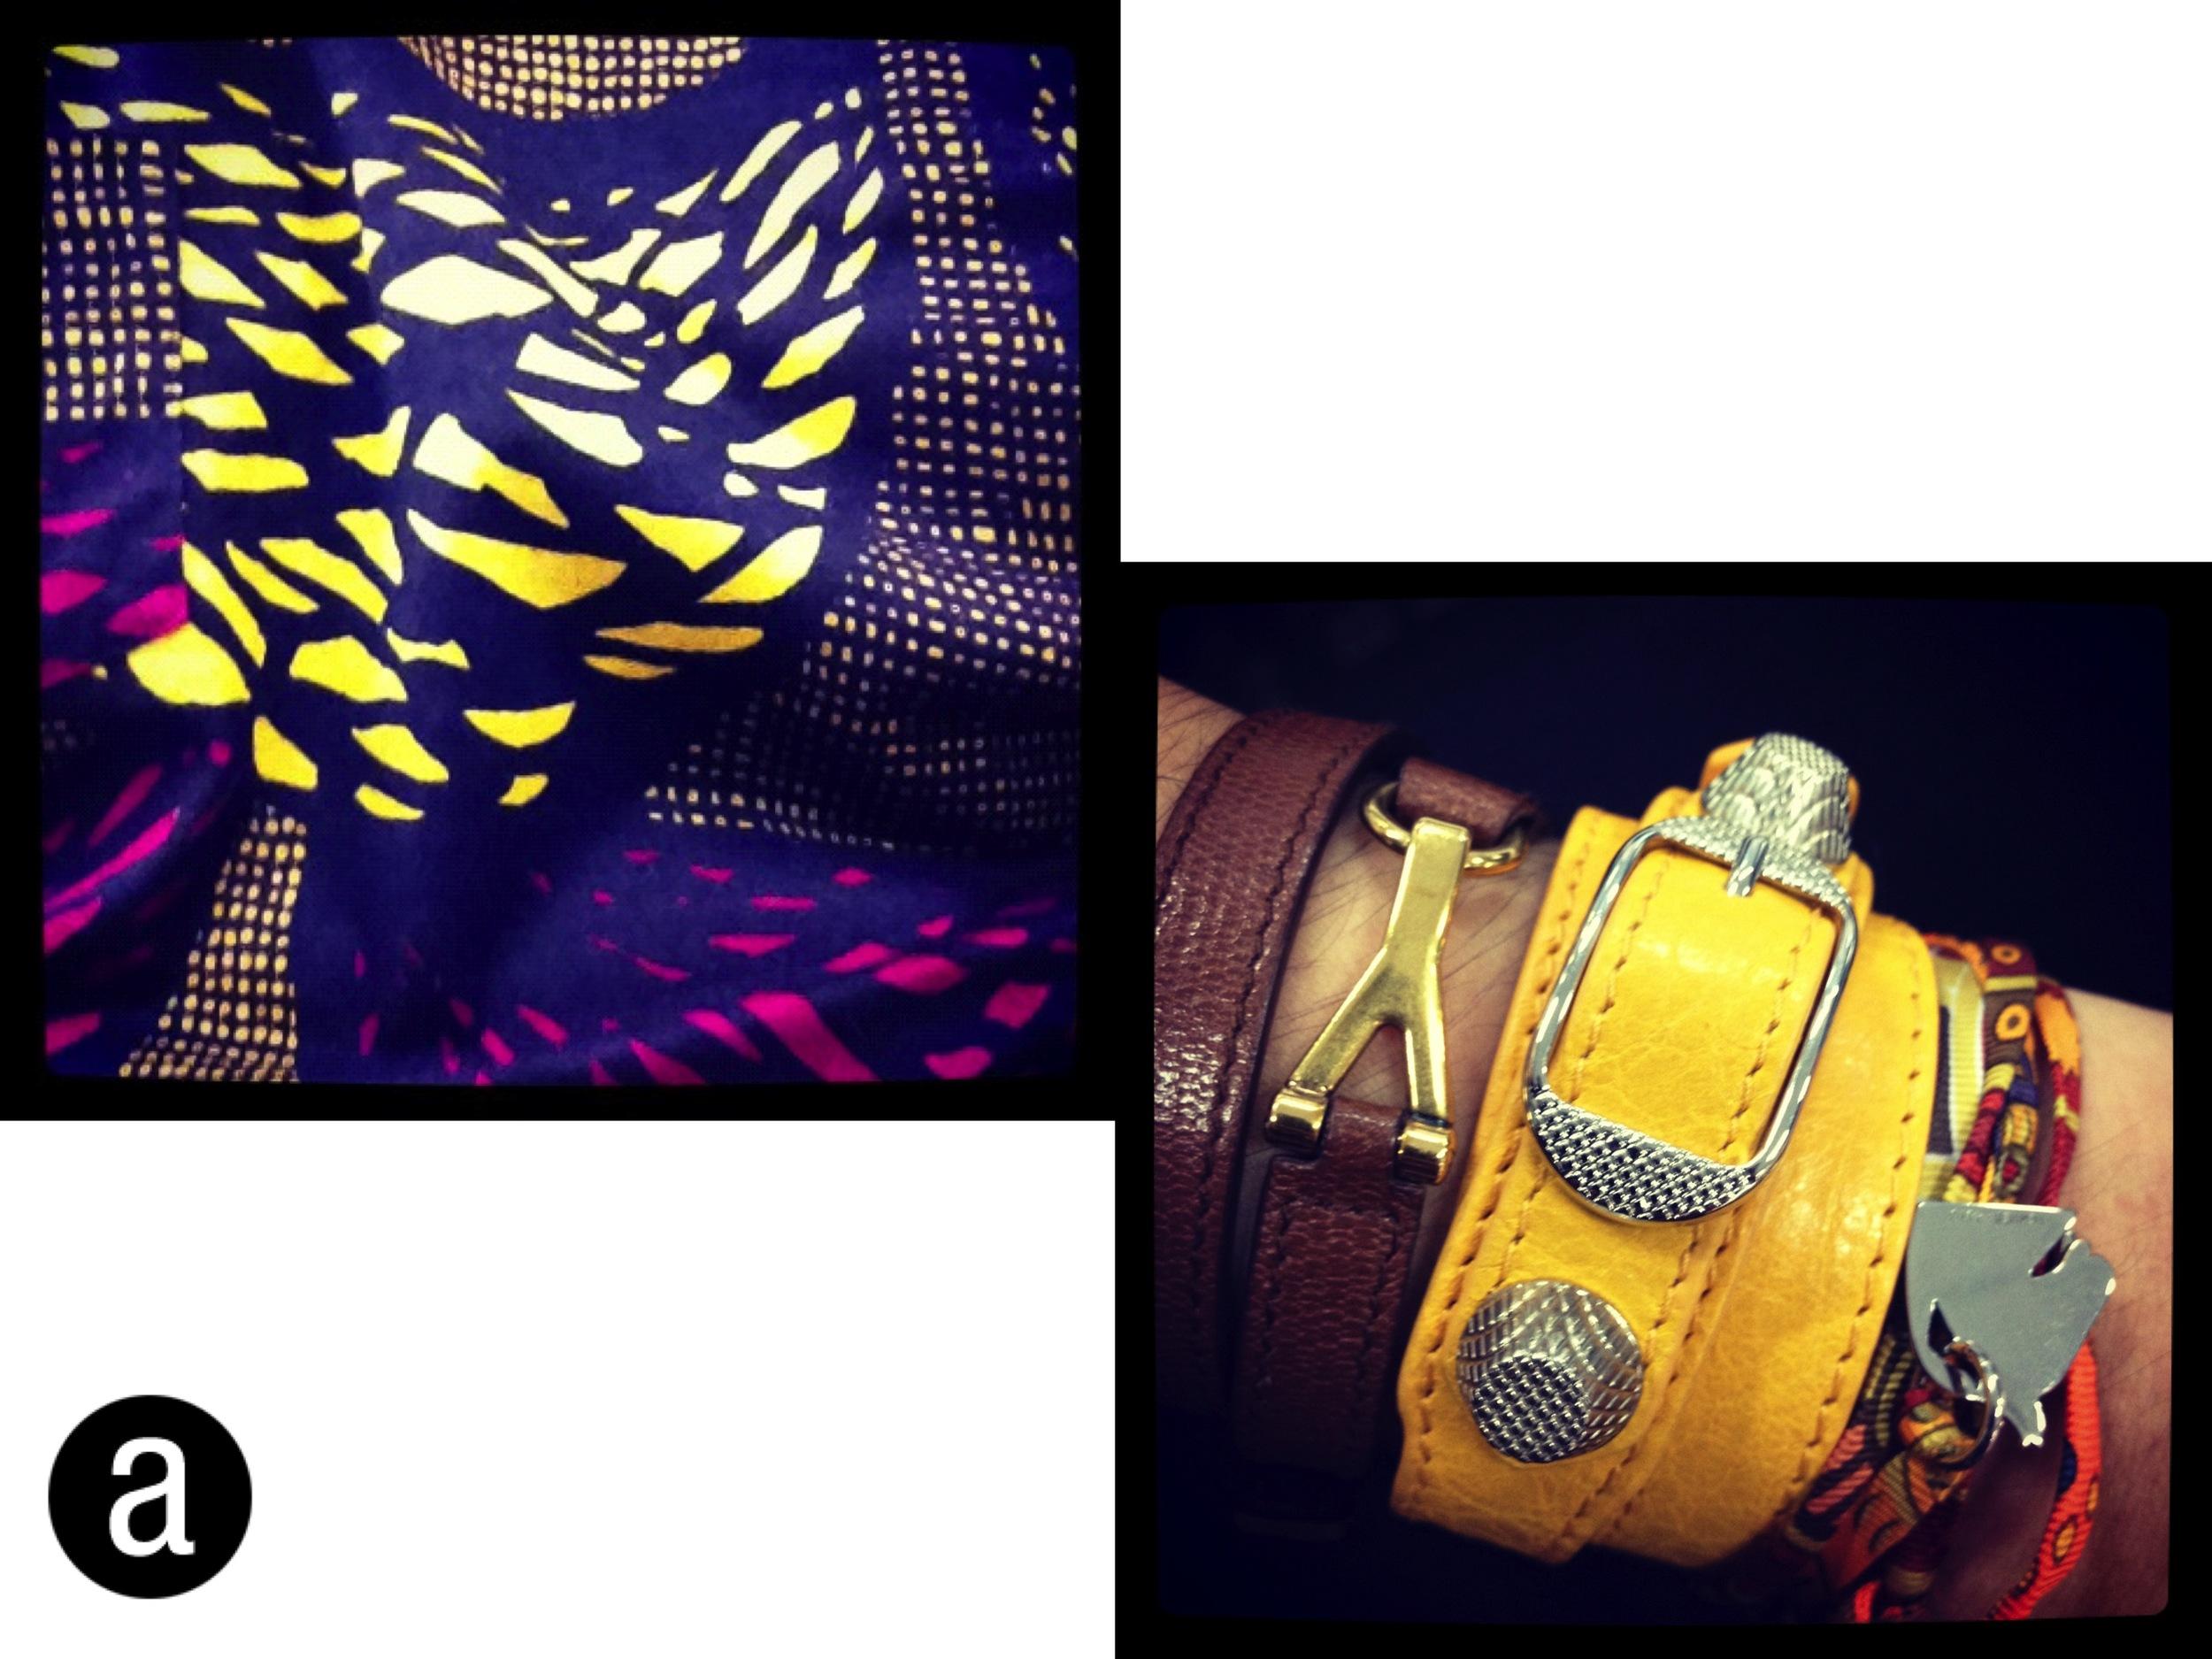 aMusing Photo Collage 5 - Prints, Patterns & Color